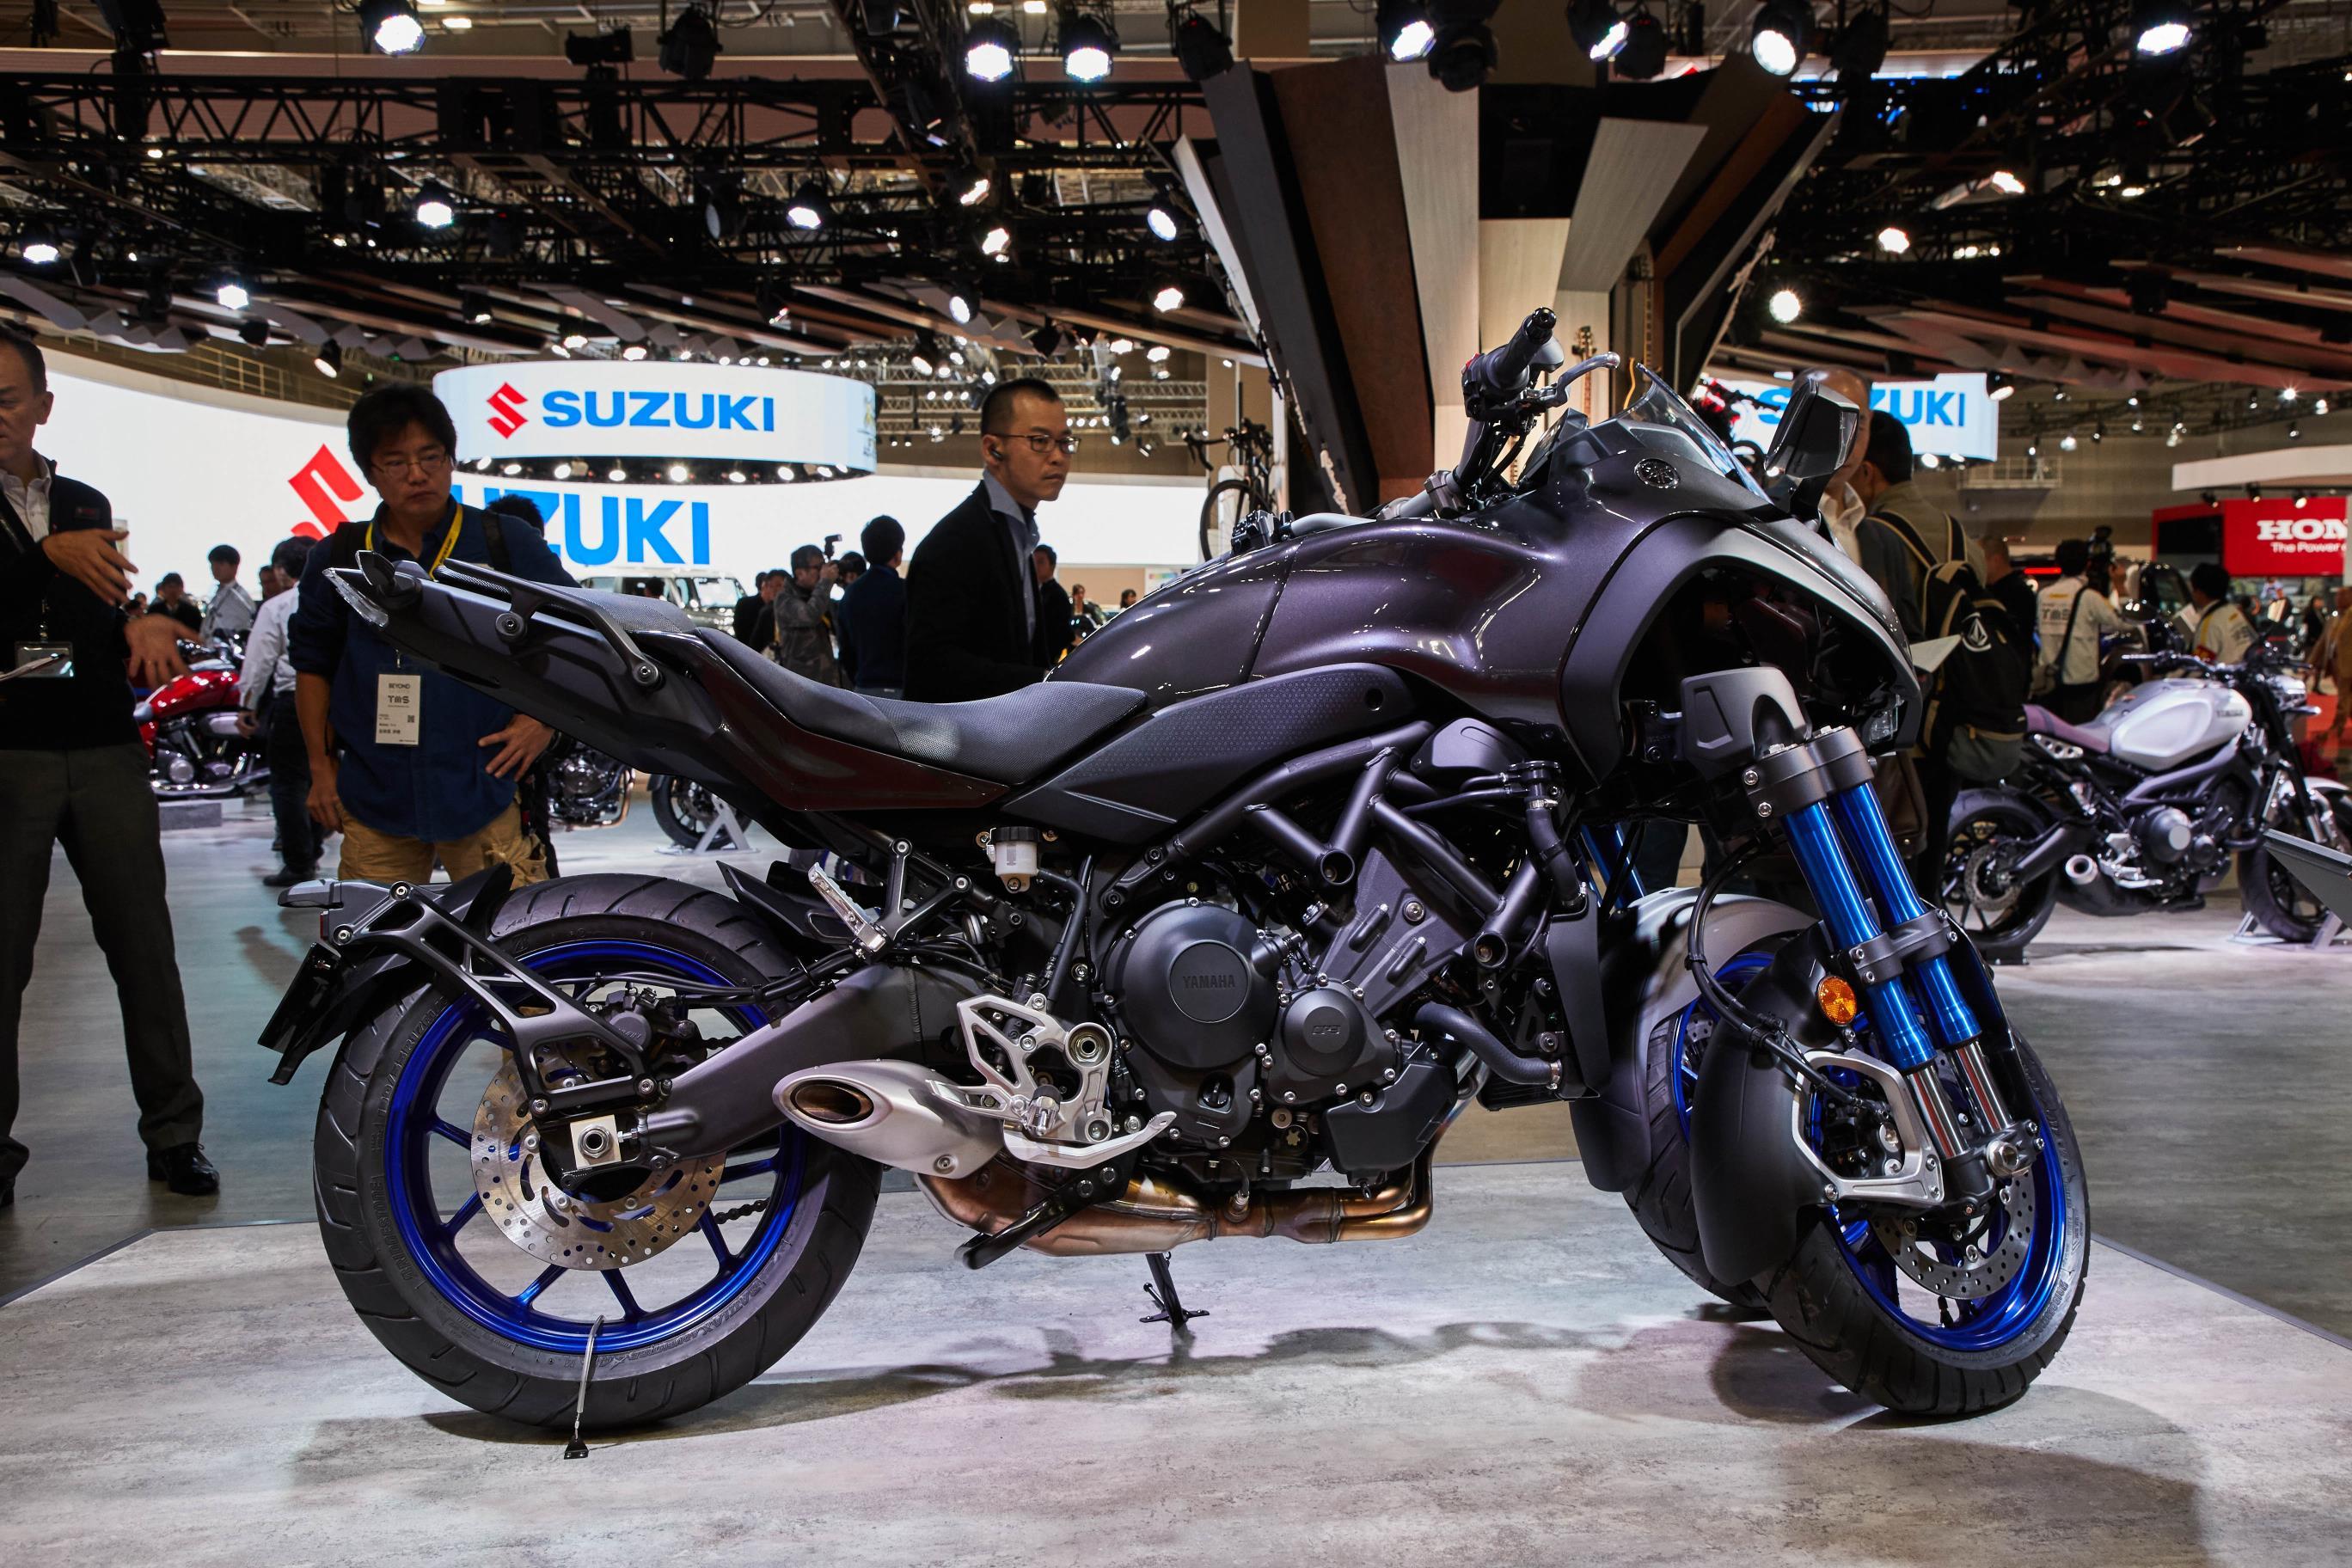 Tokyo motor show 2017 (104)